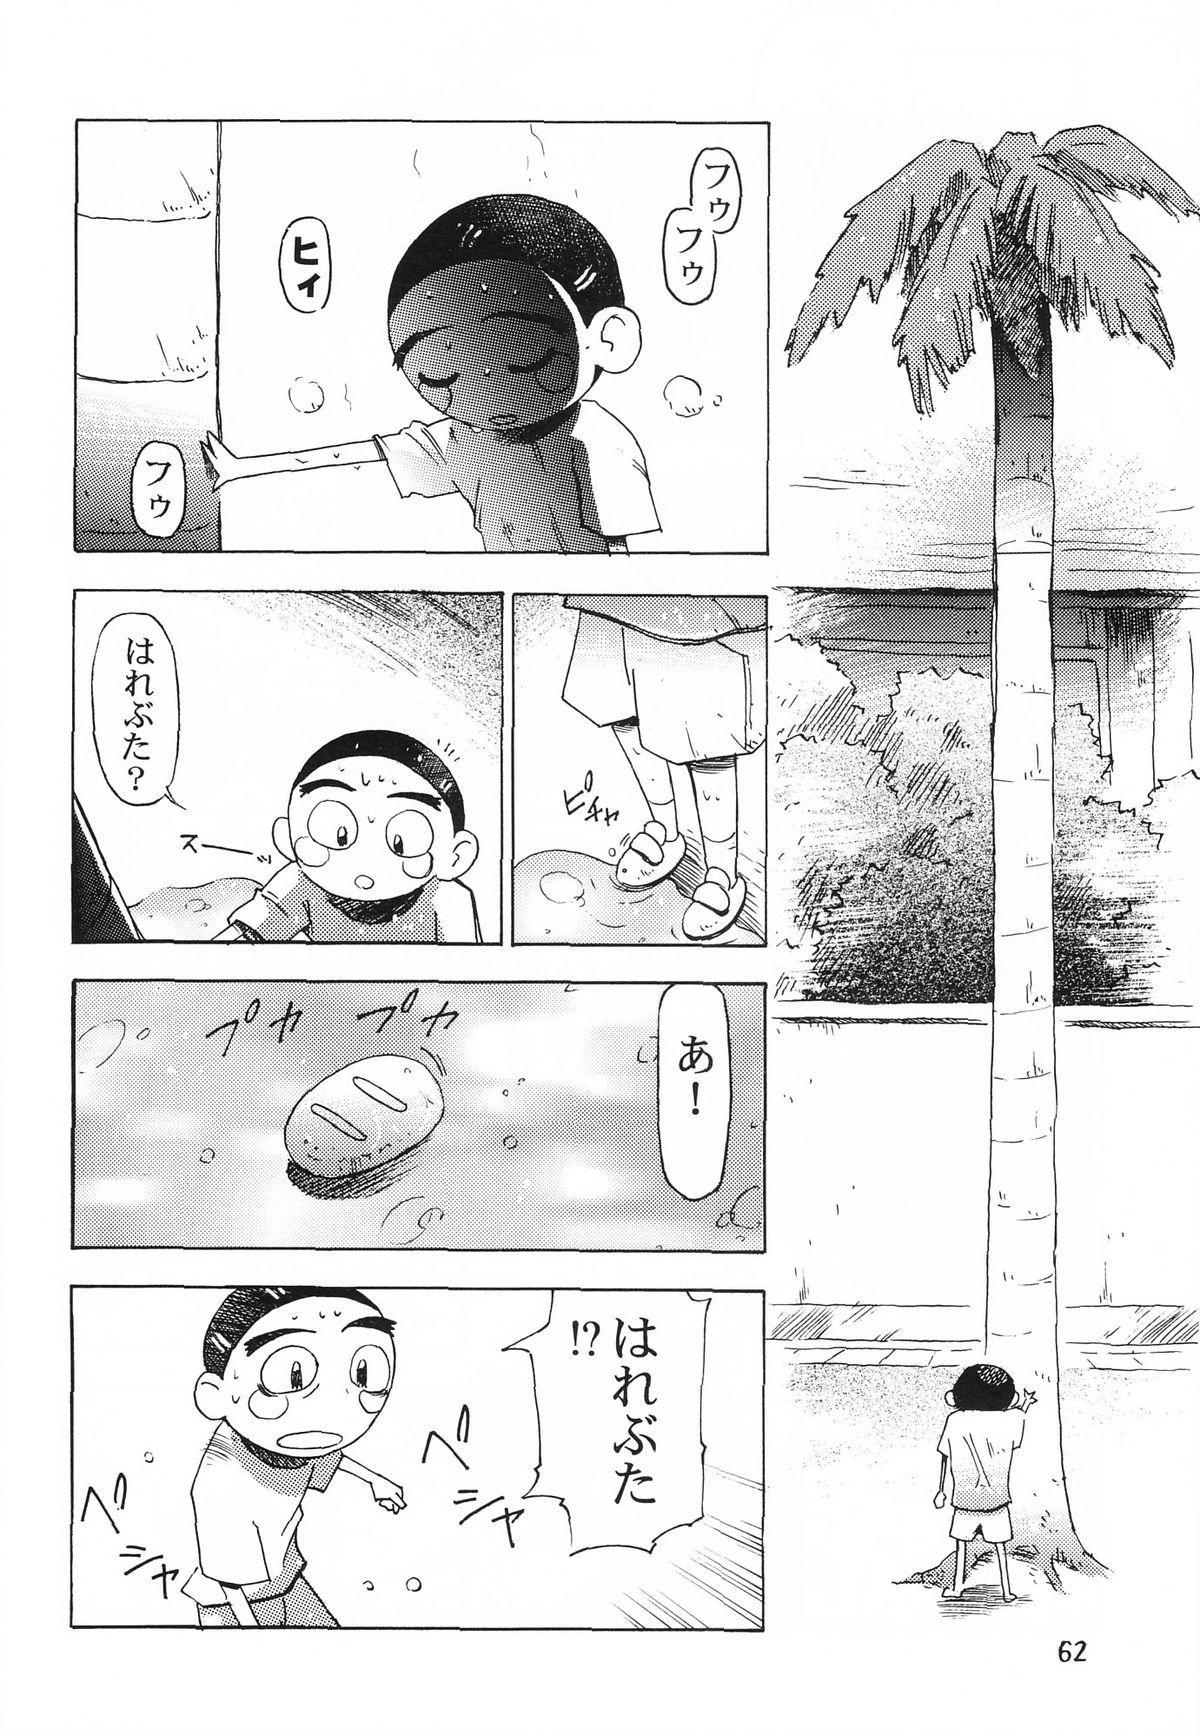 Henrei-kai '98 Natsu SPECIAL 61